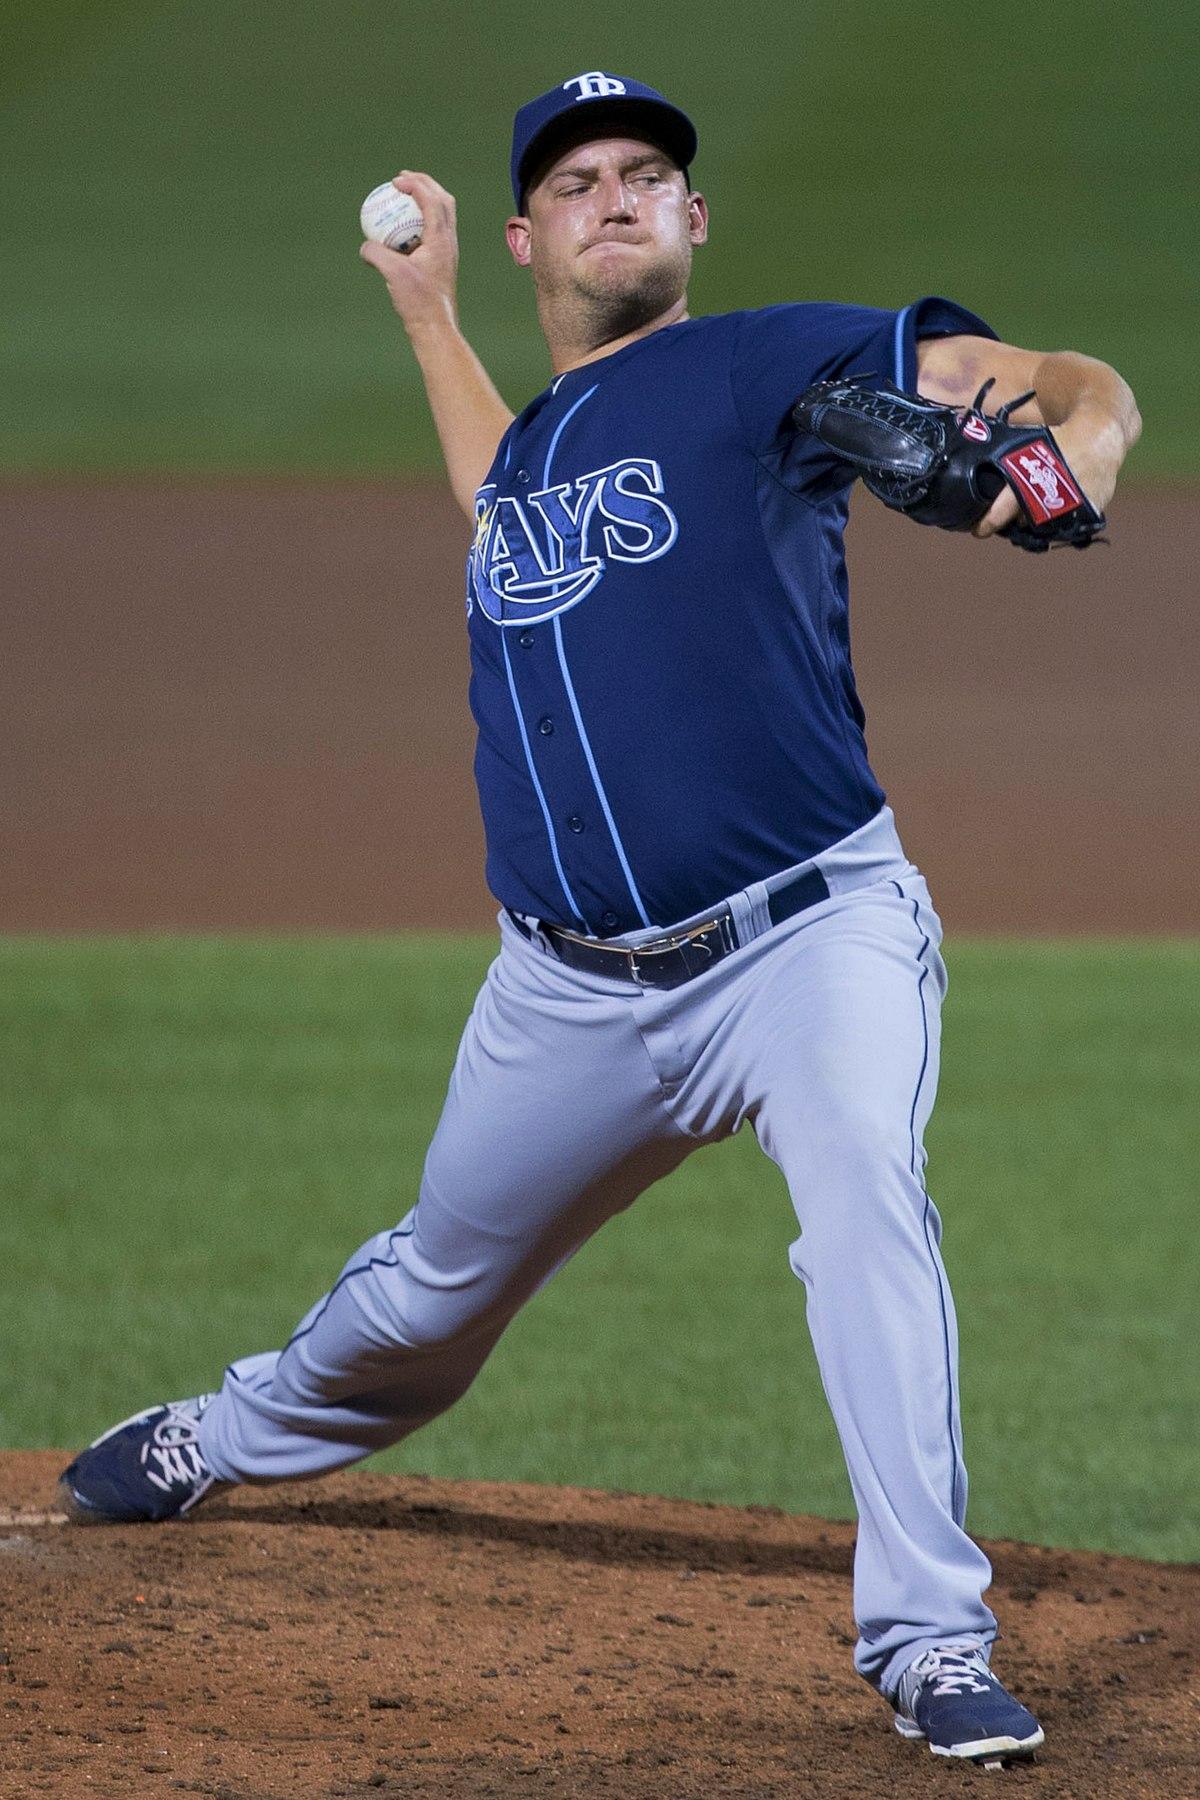 Lee University Baseball >> Matt Andriese - Wikipedia